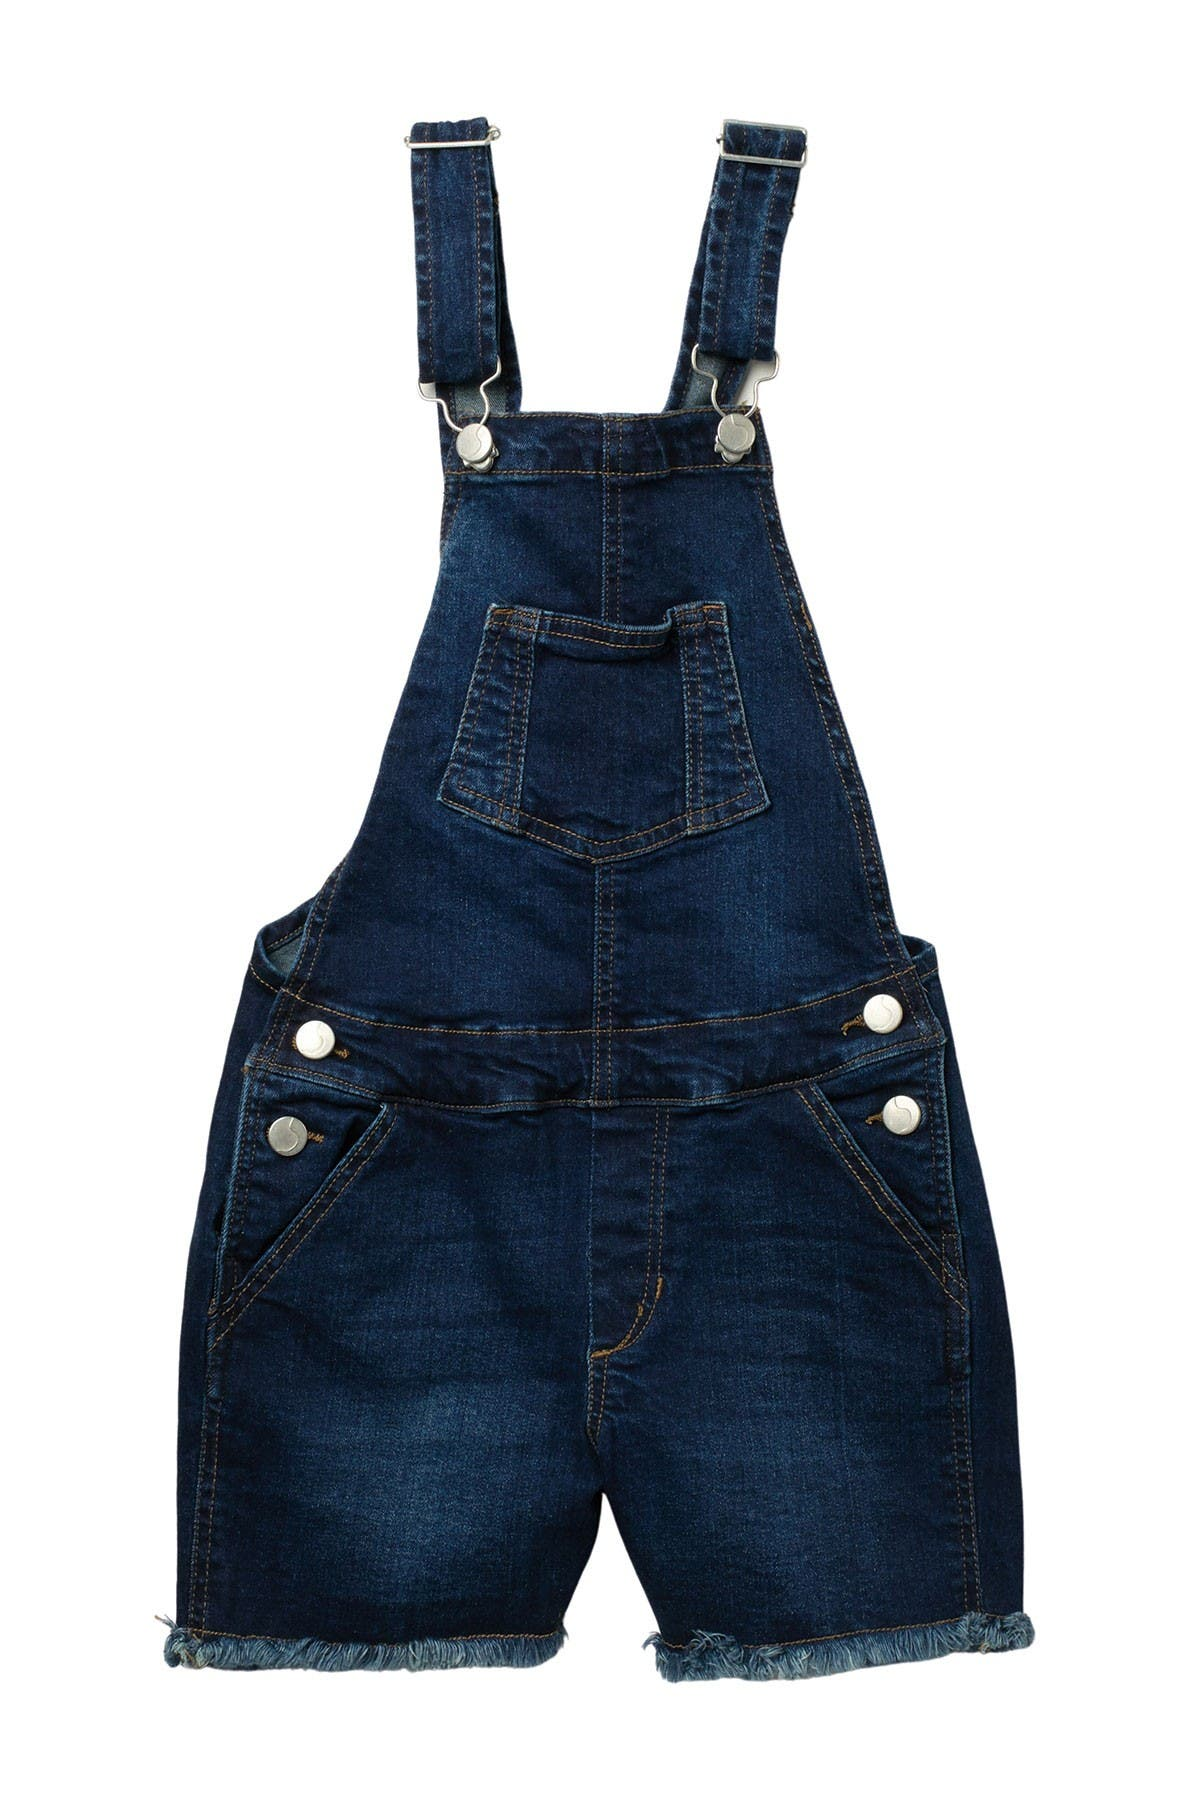 Image of Joe's Jeans Selma Cutoff Denim Overalls